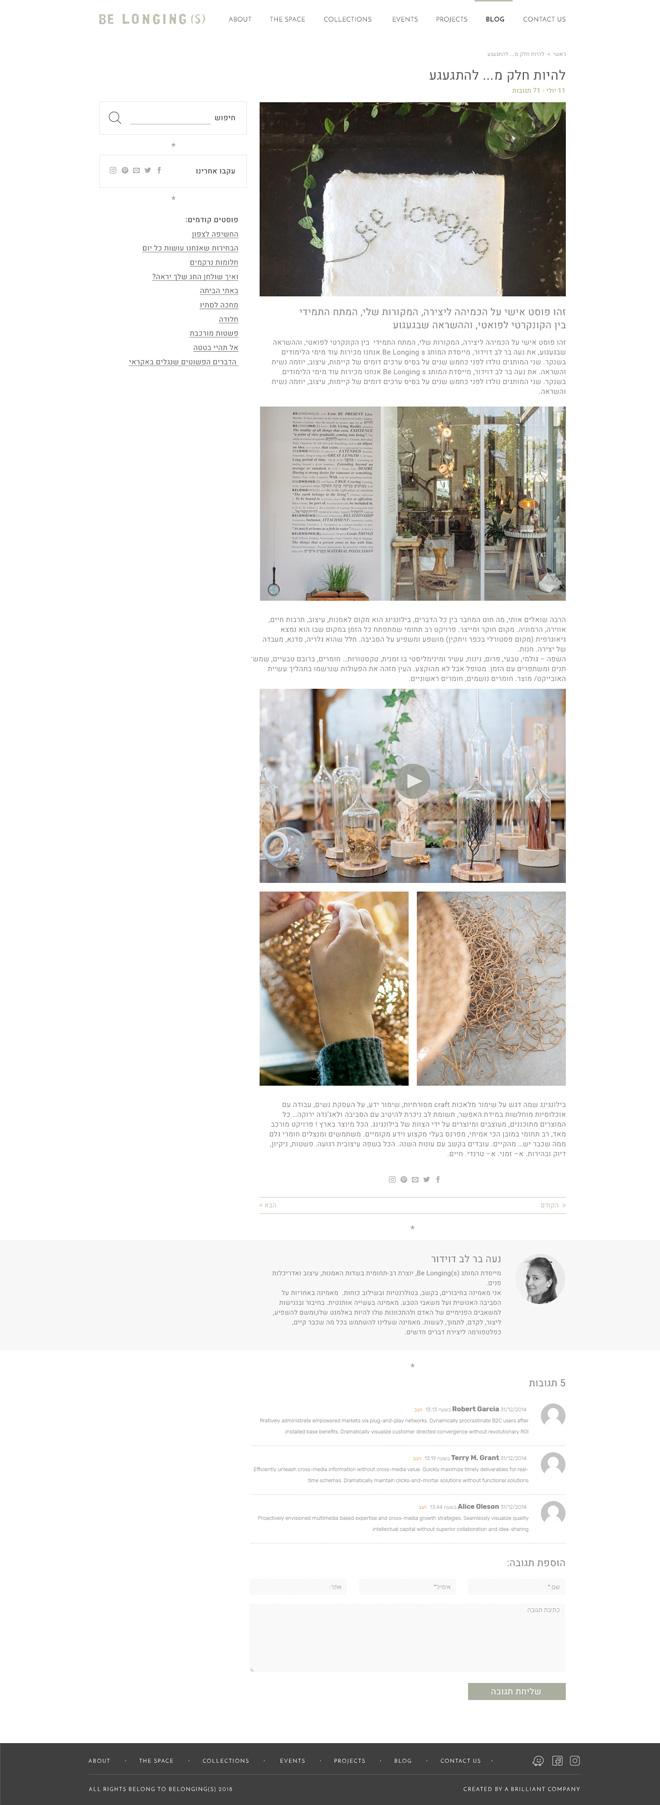 Belonging blog inner page